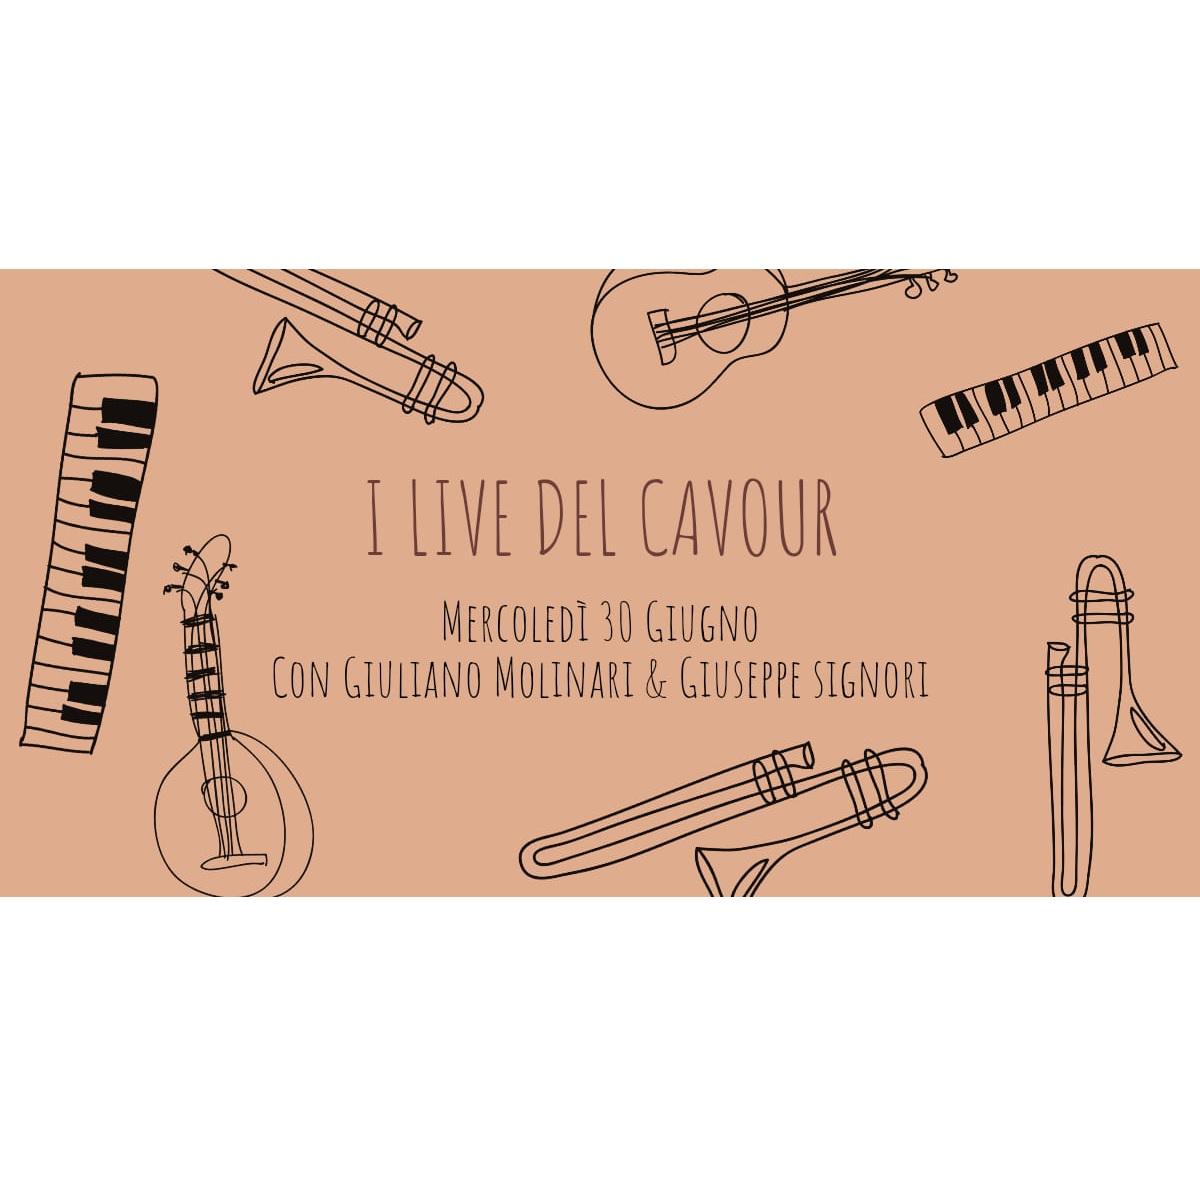 Mercoledì 30 giugno tornano i live del Cavour foto